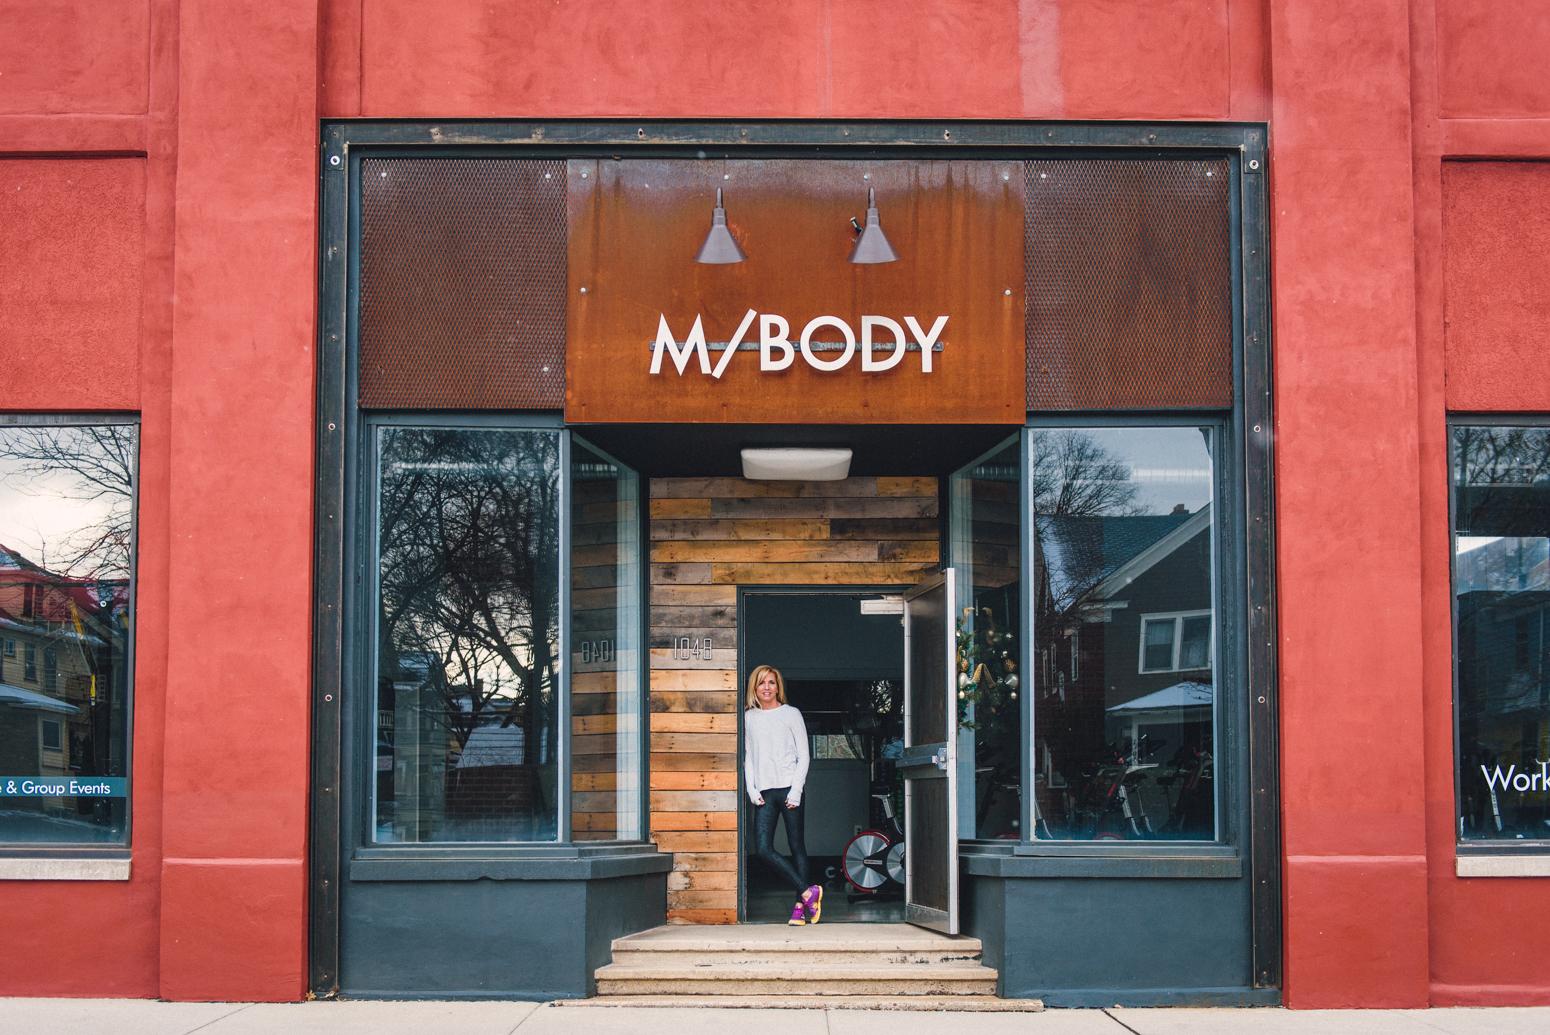 M-Body 316.jpg